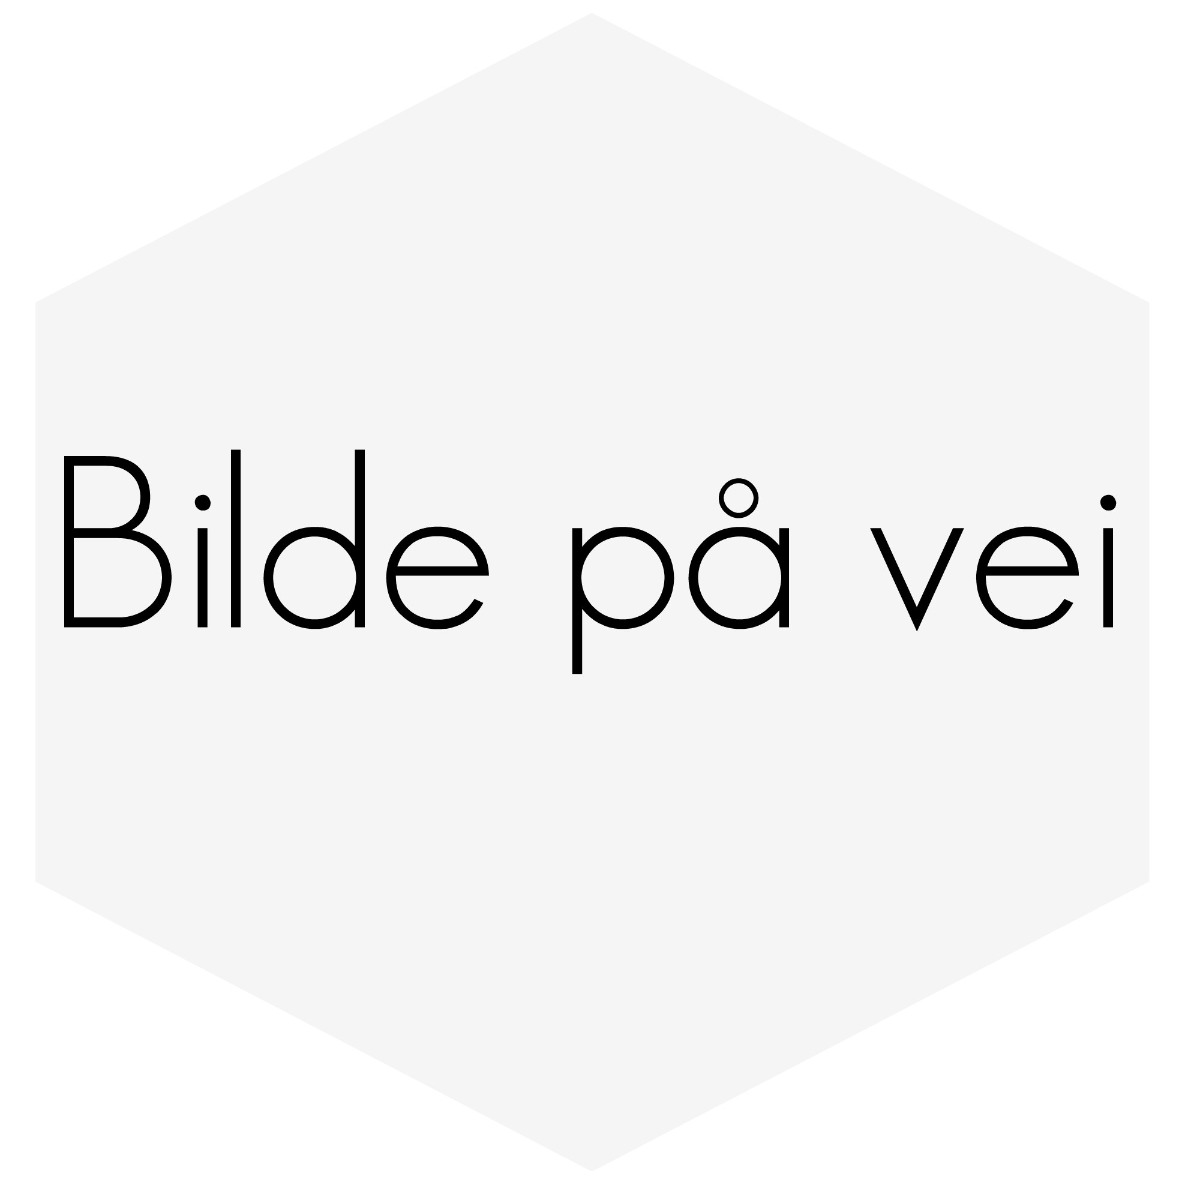 LASTESTATIV VOLVO 850 V70 DIV ANDRE. pris for en stk. bøyle